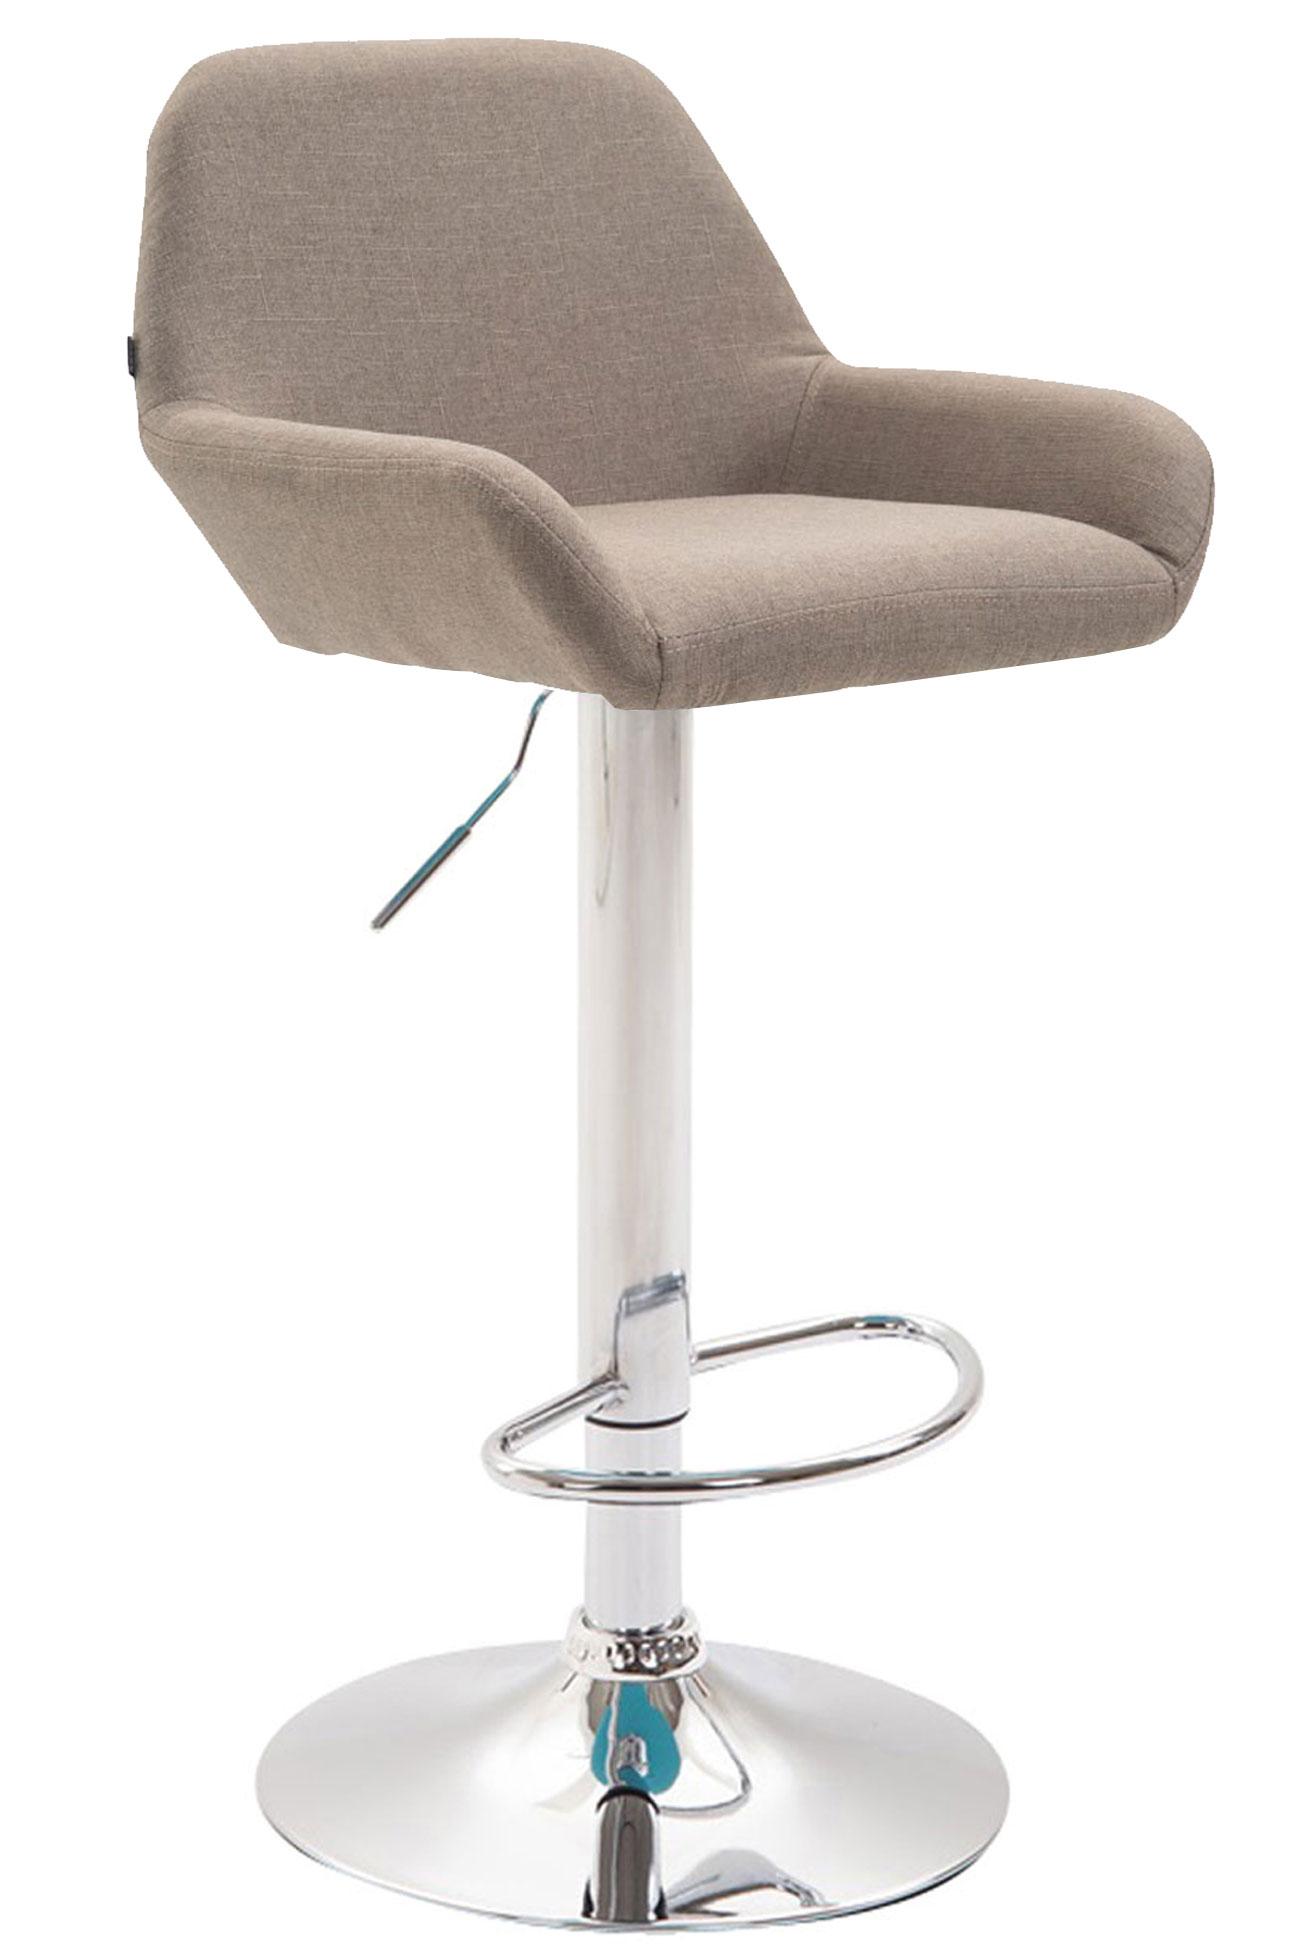 tabouret de bar braga tissu chaise haute de bar r glable. Black Bedroom Furniture Sets. Home Design Ideas